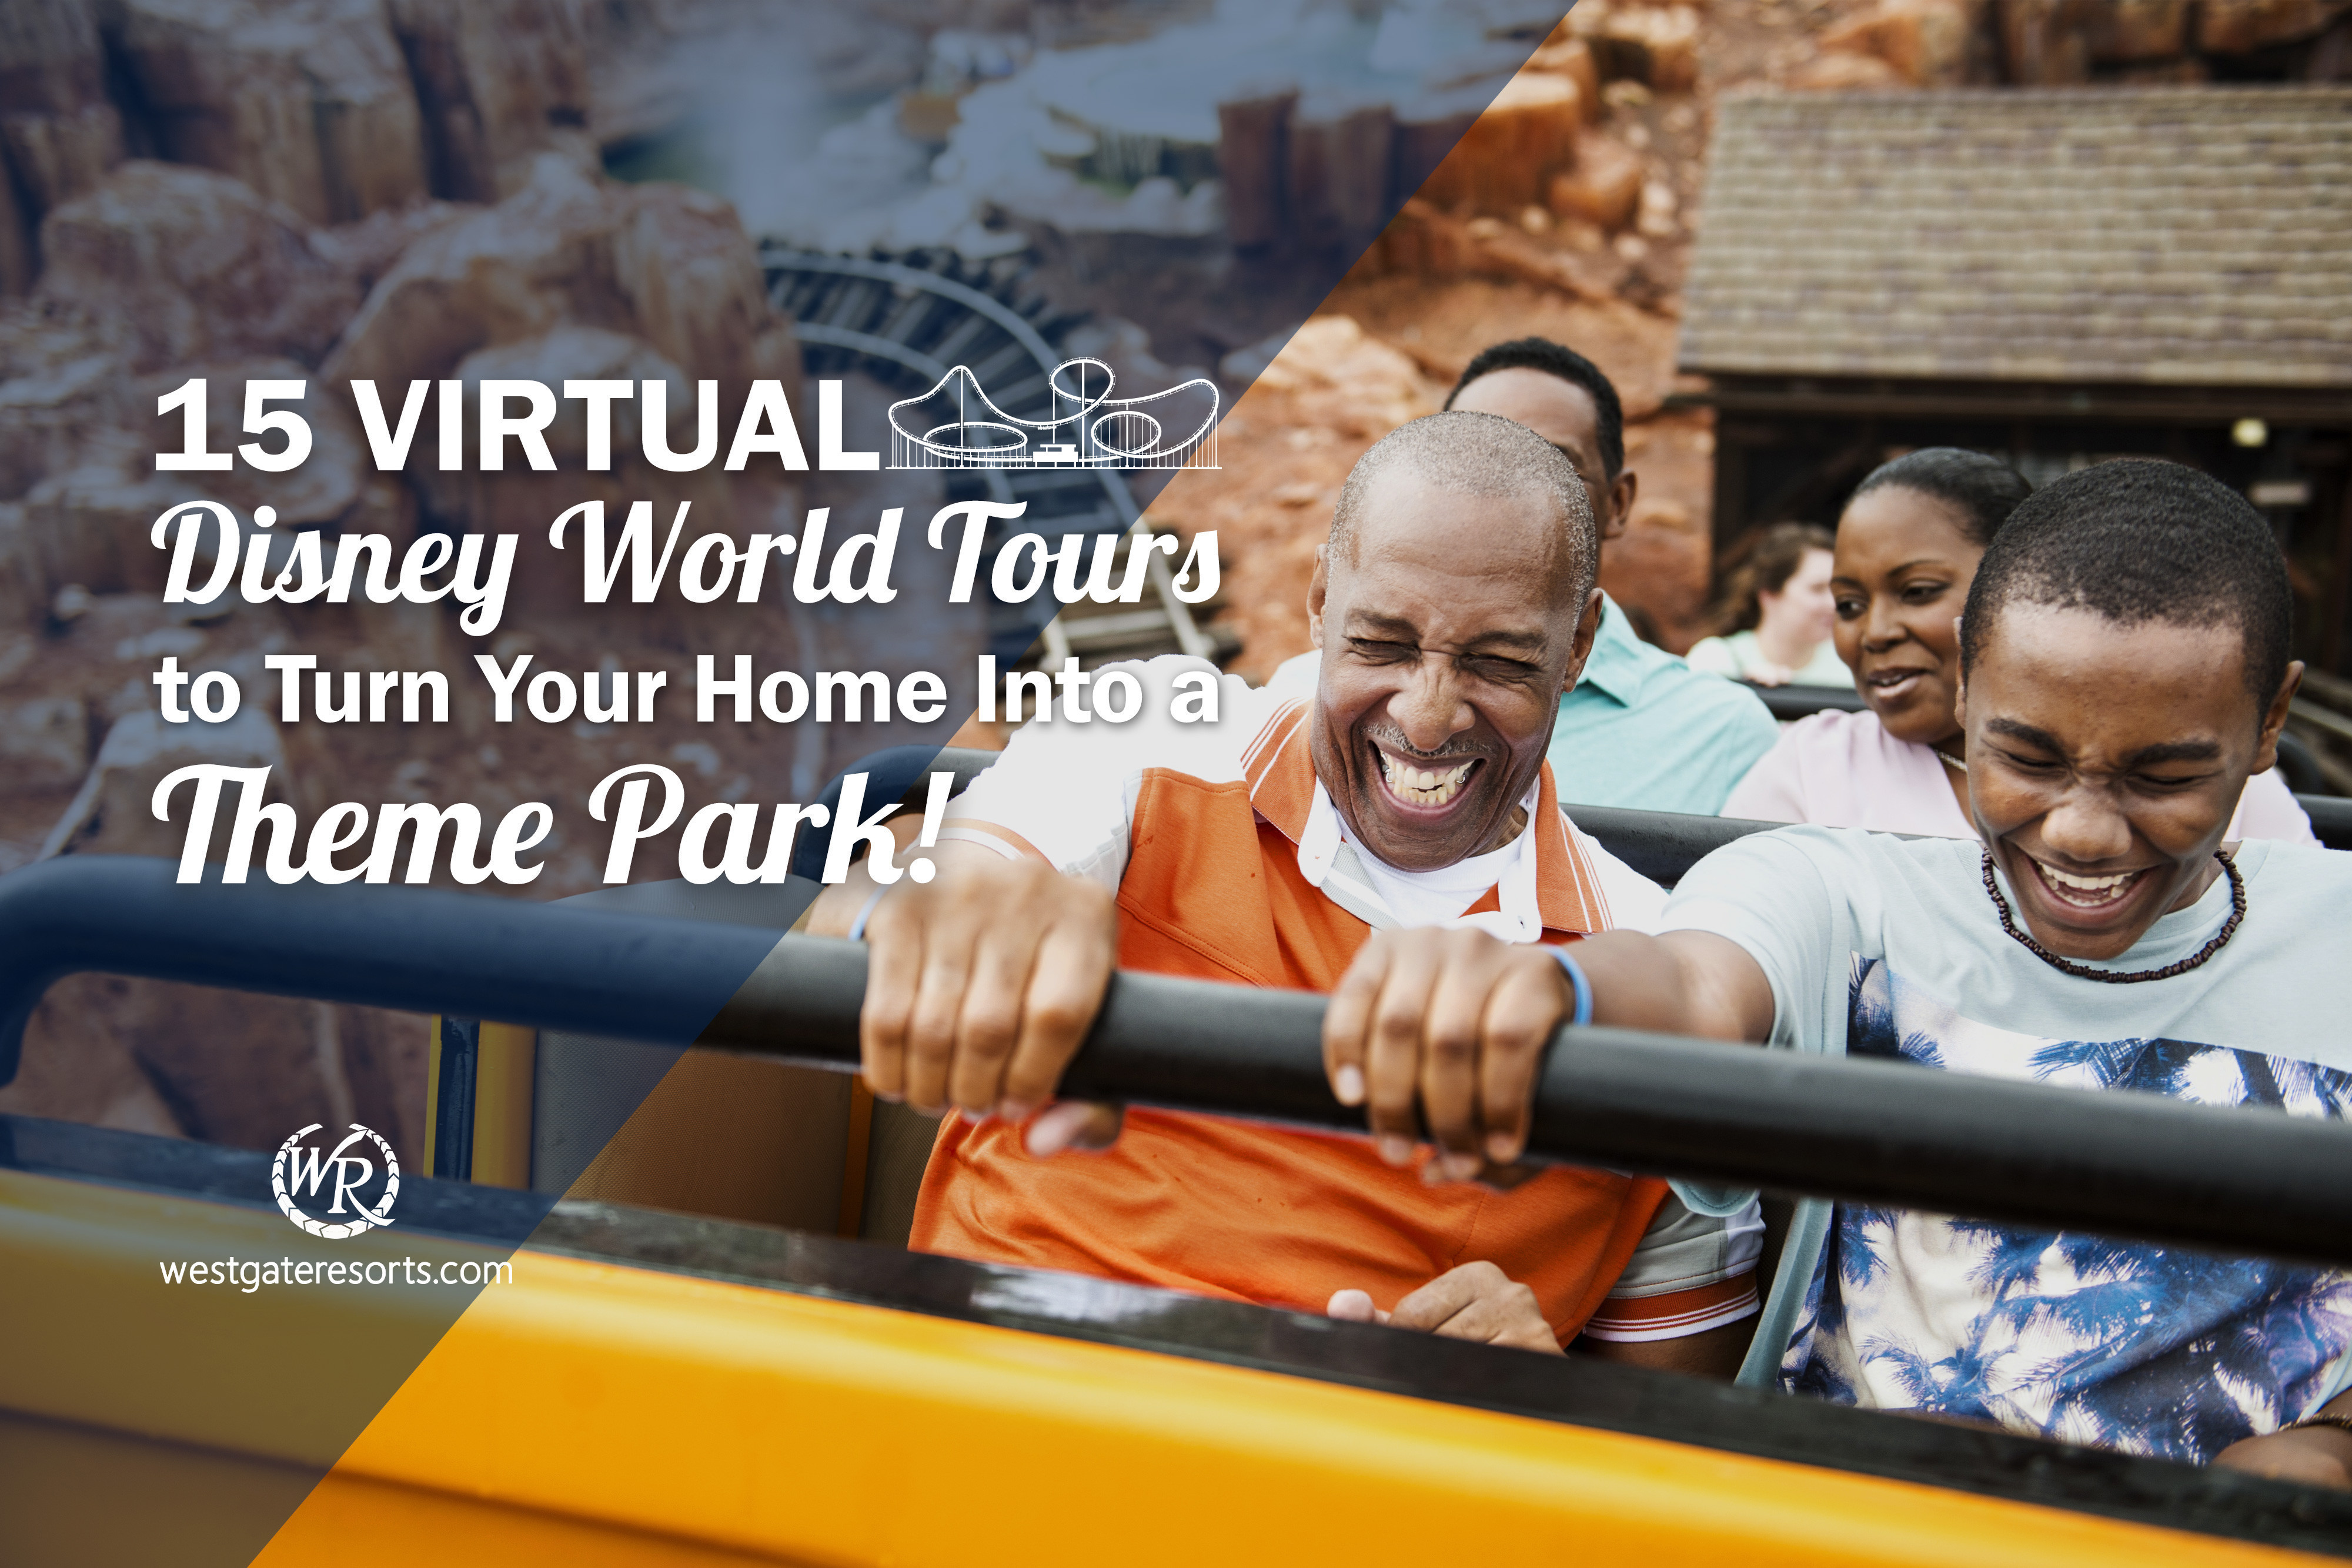 15 Virtual Disney World Tours to Turn Your Home Into a Theme Park!